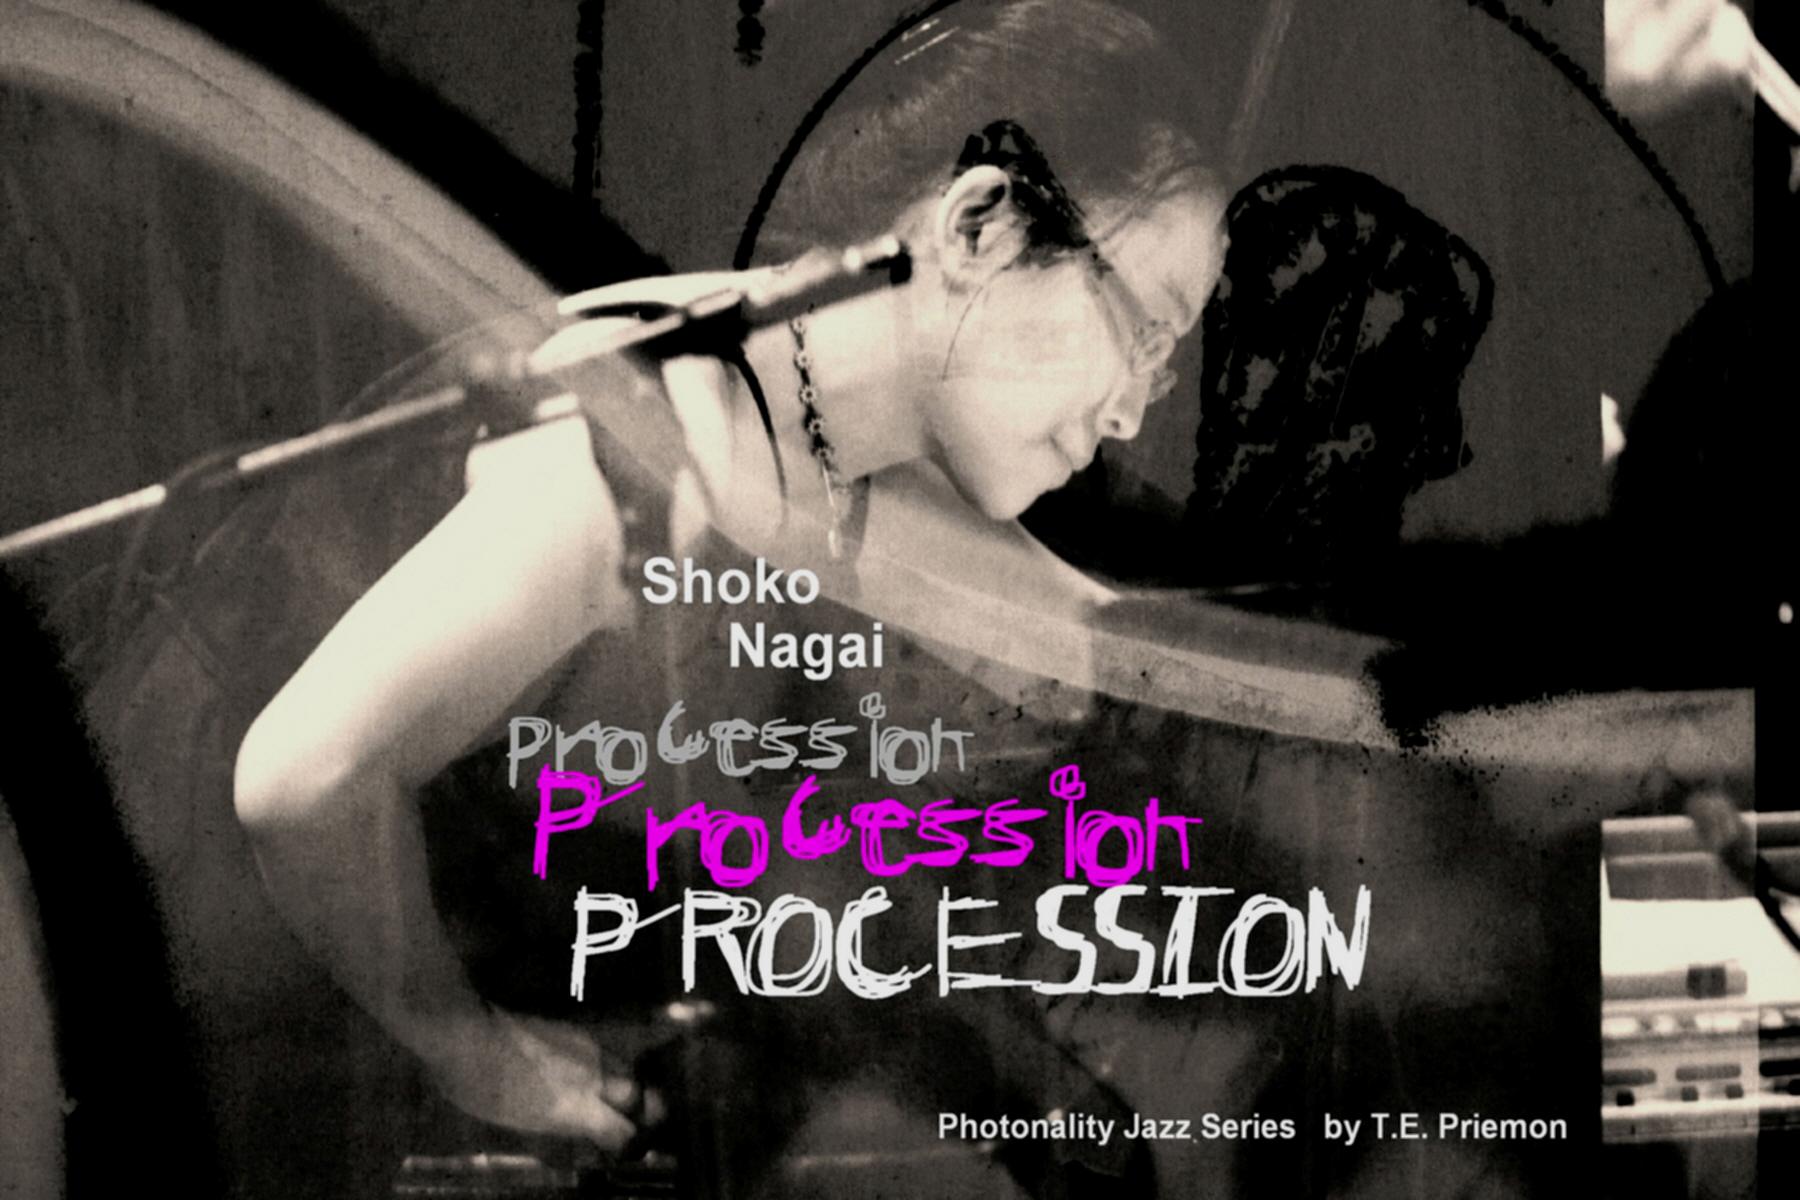 Procession with Shoko Nagai